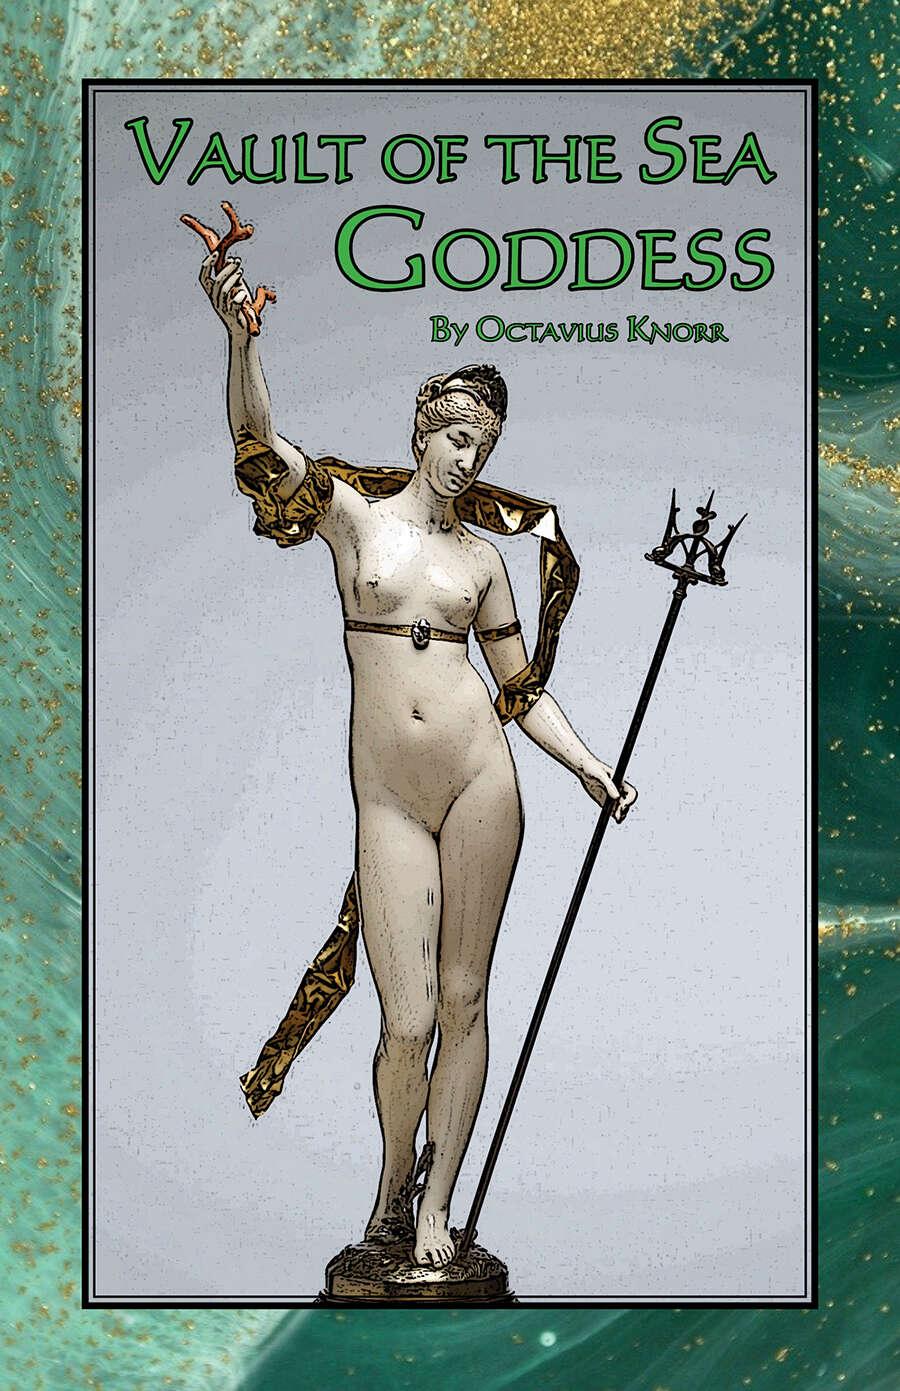 Vault of the Sea Goddess